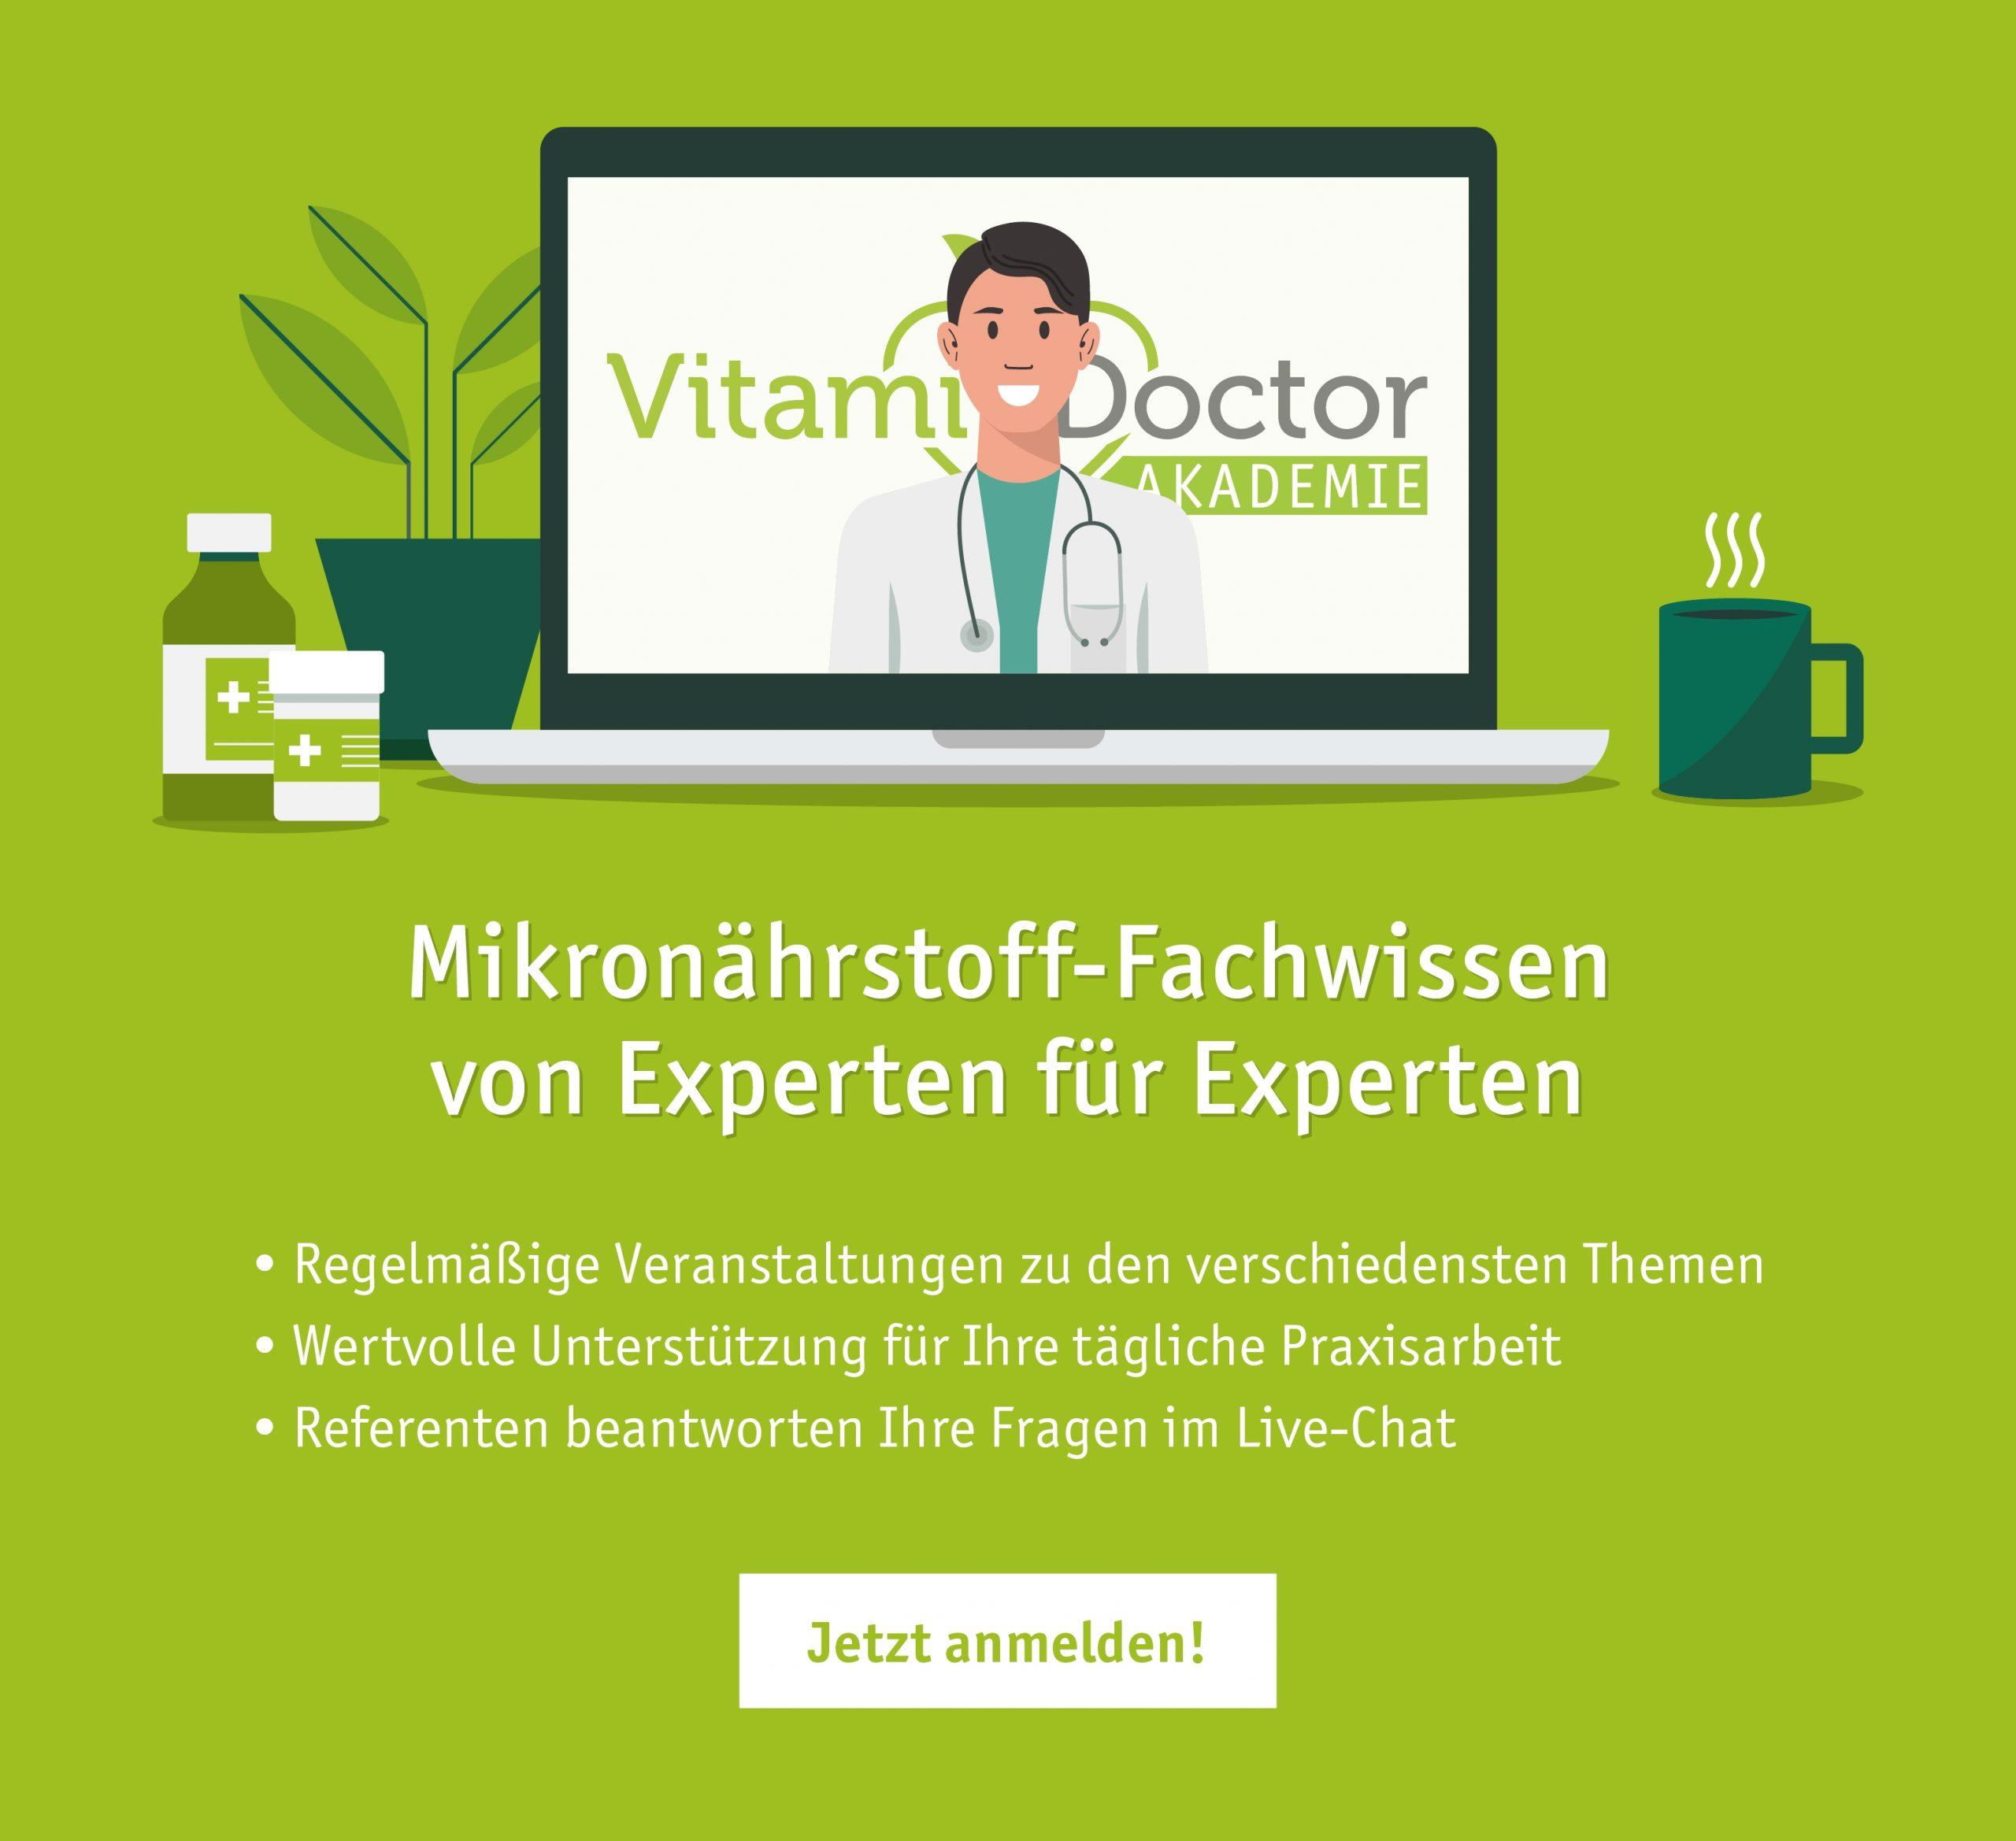 Liveseminar VitaminDoctor.com